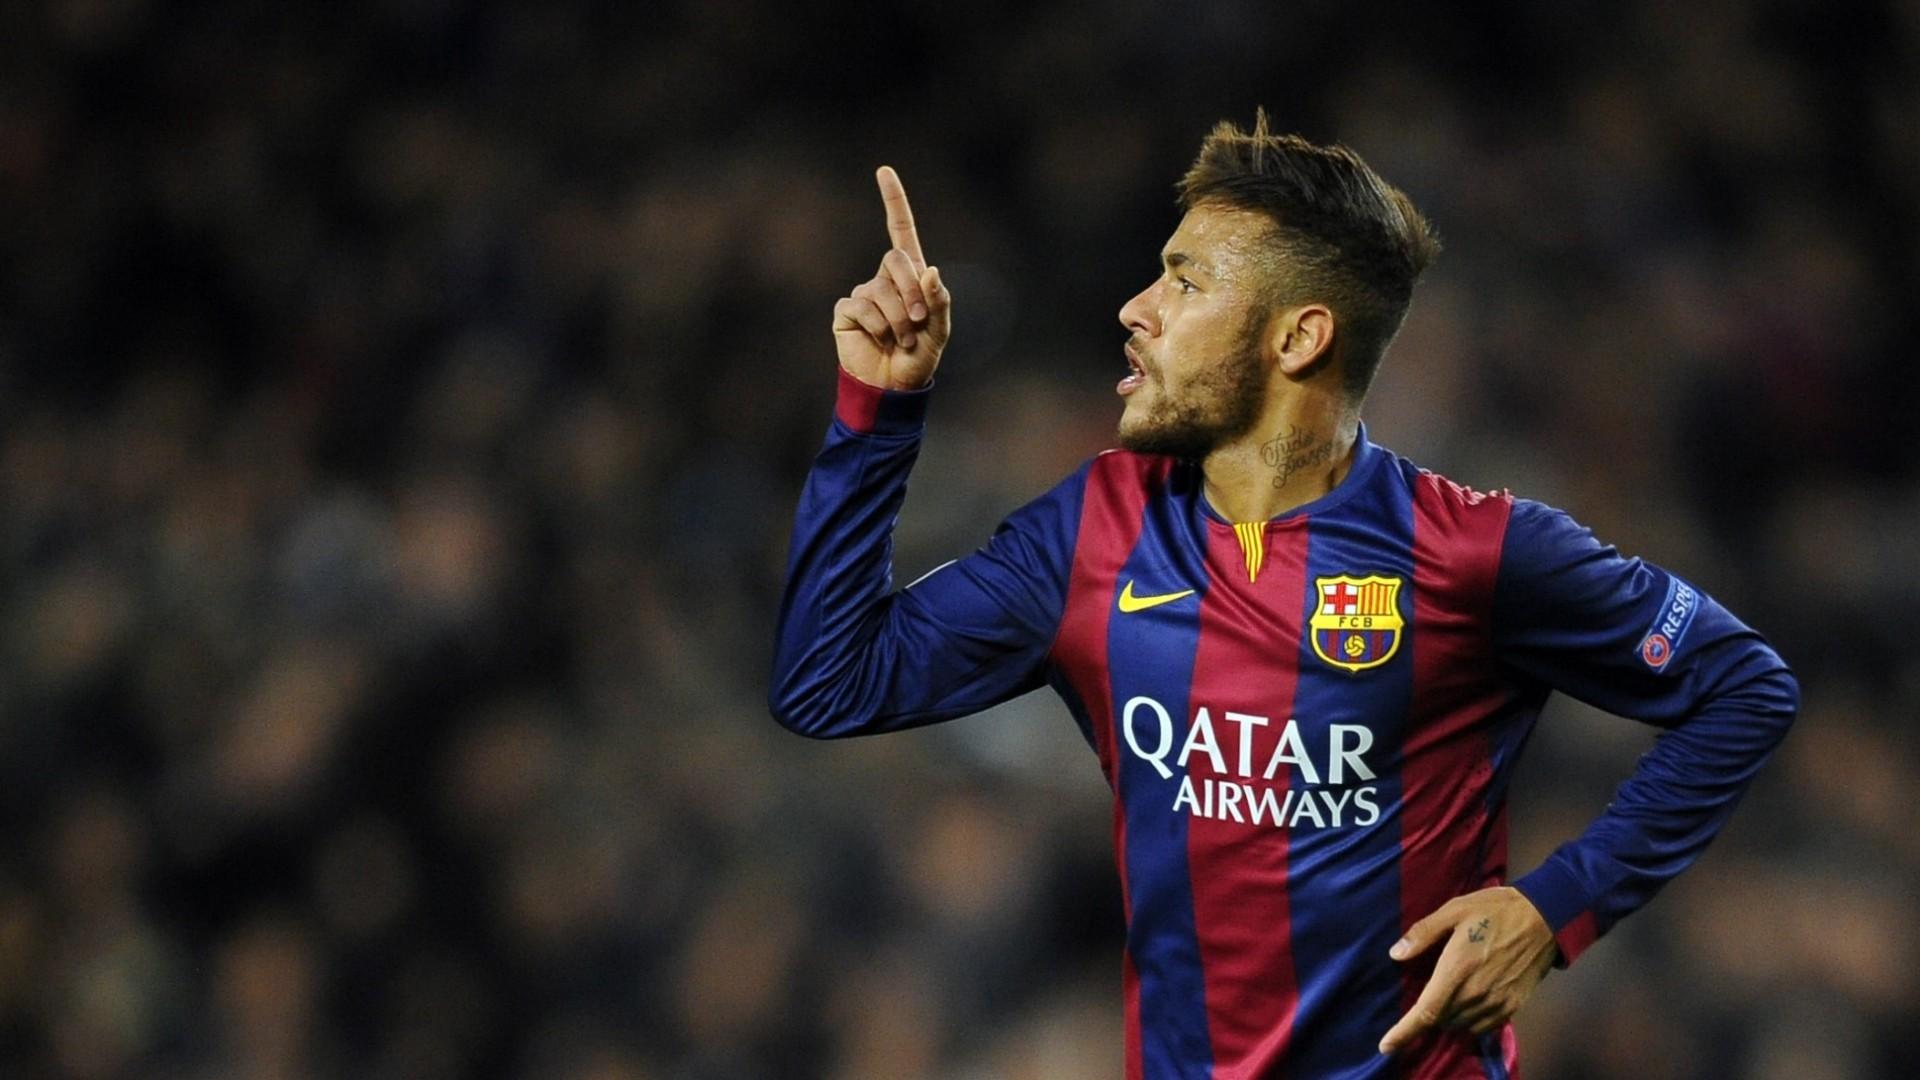 … Background Full HD 1080p. Wallpaper neymar, barcelona,  football